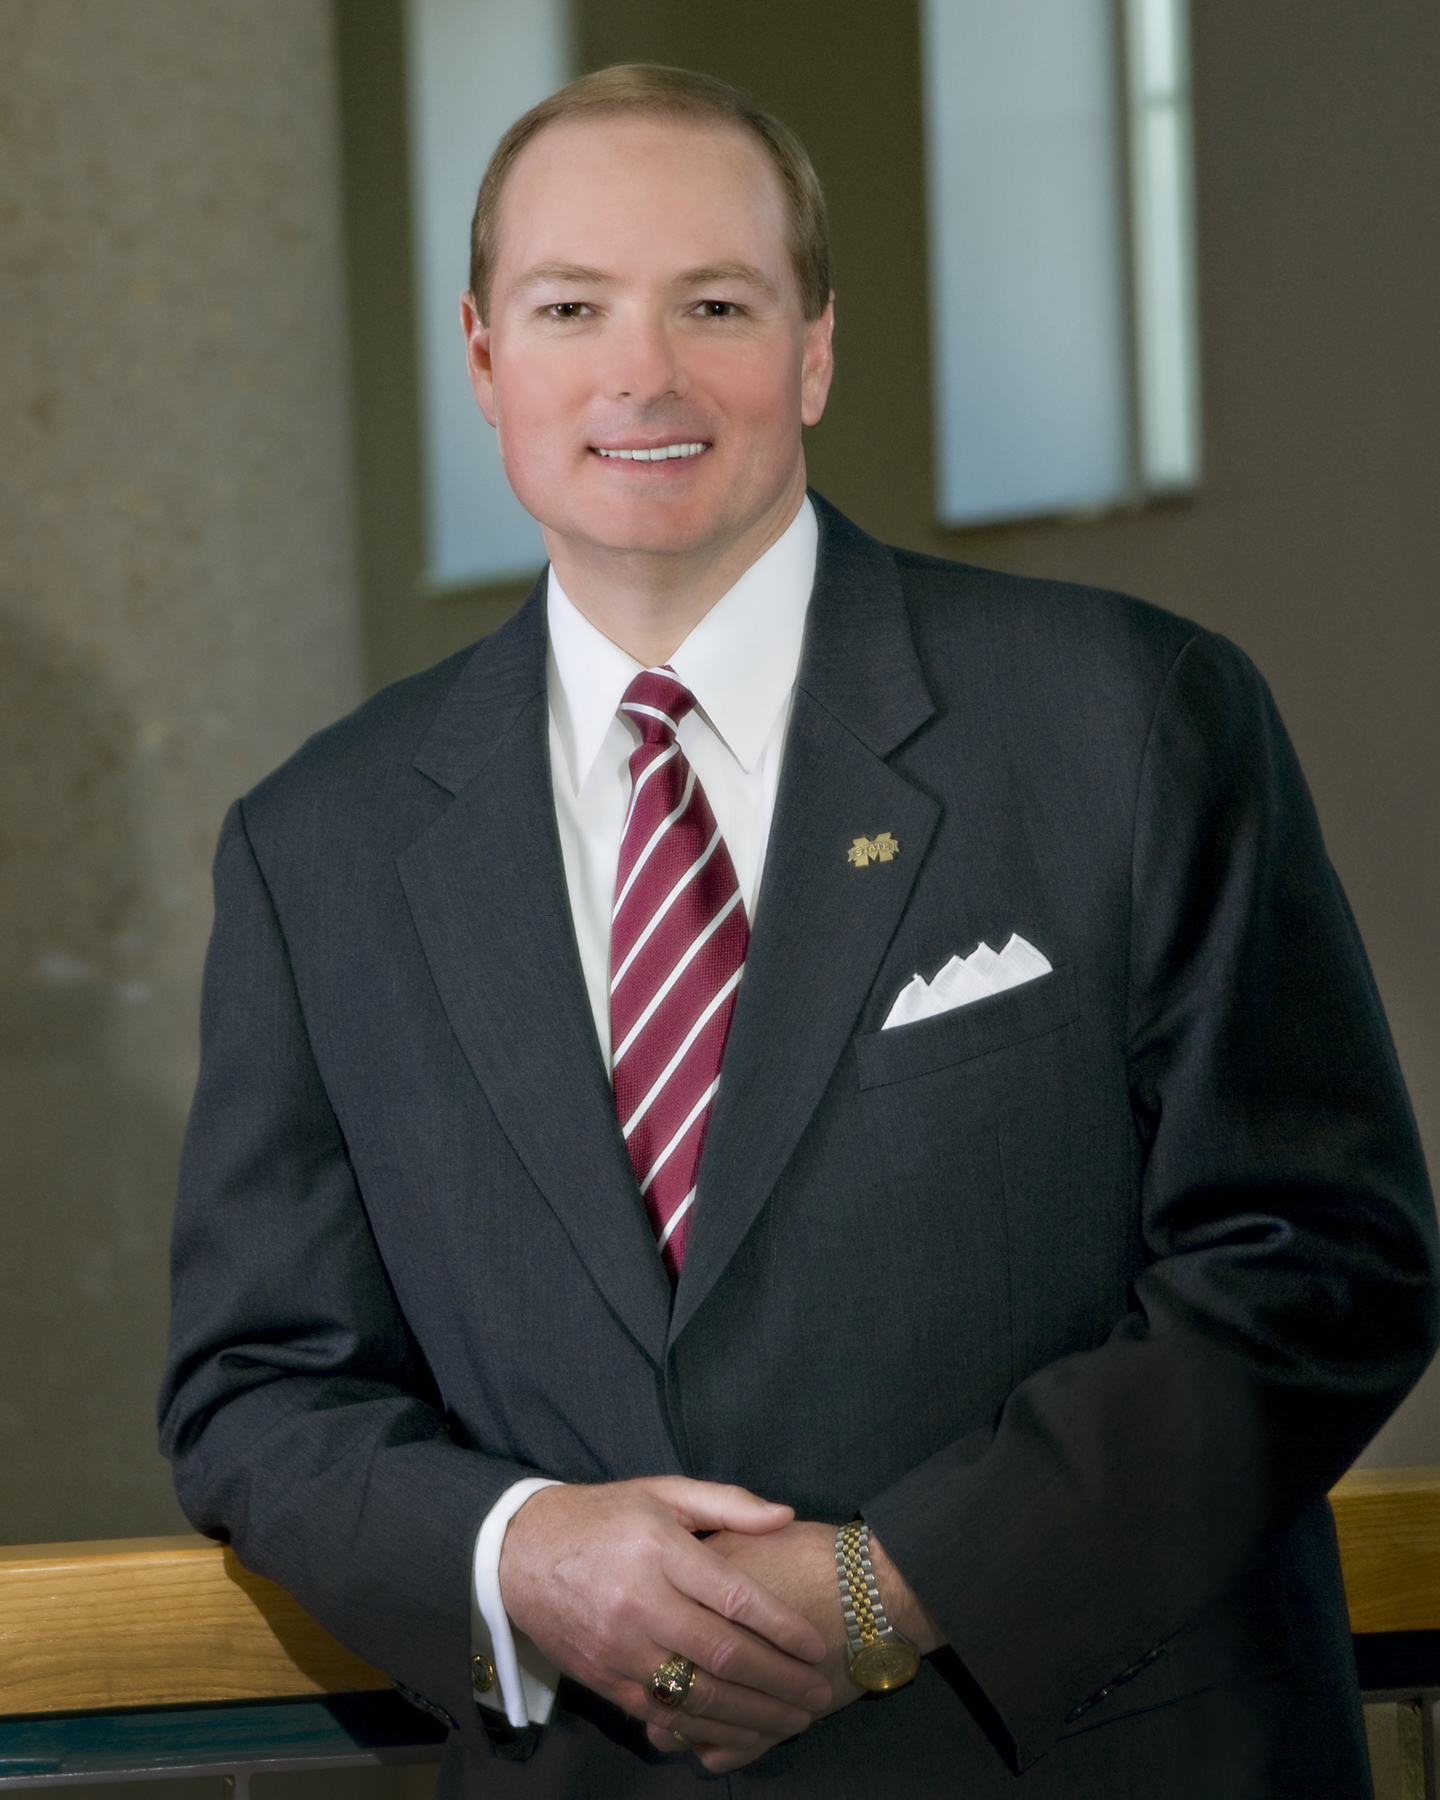 MSU President Mark E. Keenum